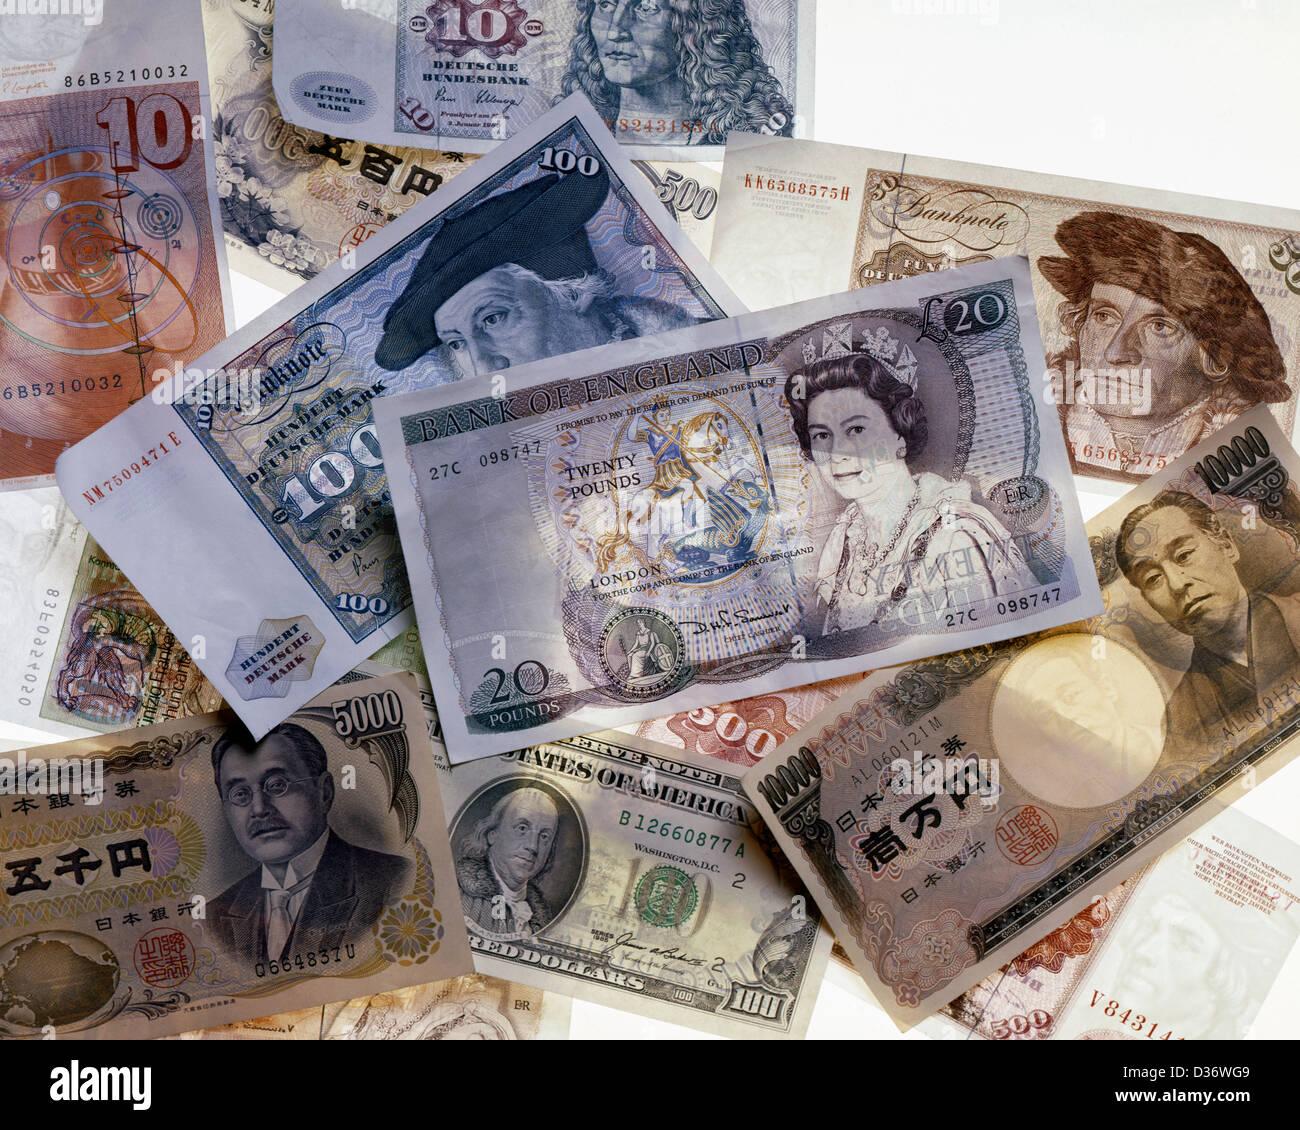 International paper money - Stock Image